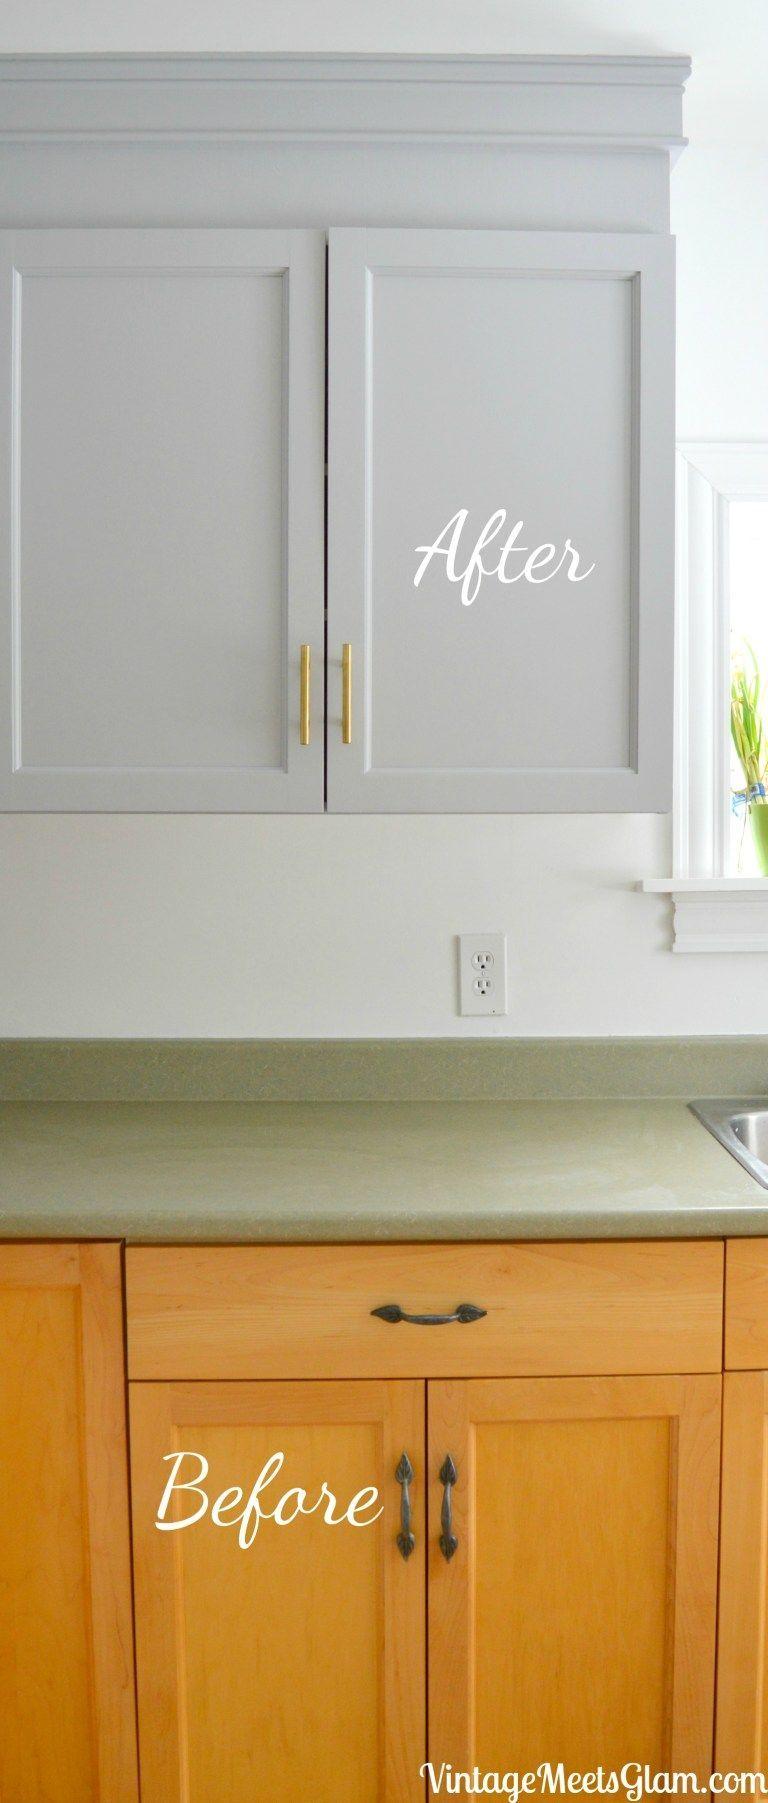 Amazing Diy Kitchen Cabinets Plans In 2020 Diy Kitchen Cabinets Kitchen Cabinet Plans New Kitchen Cabinets